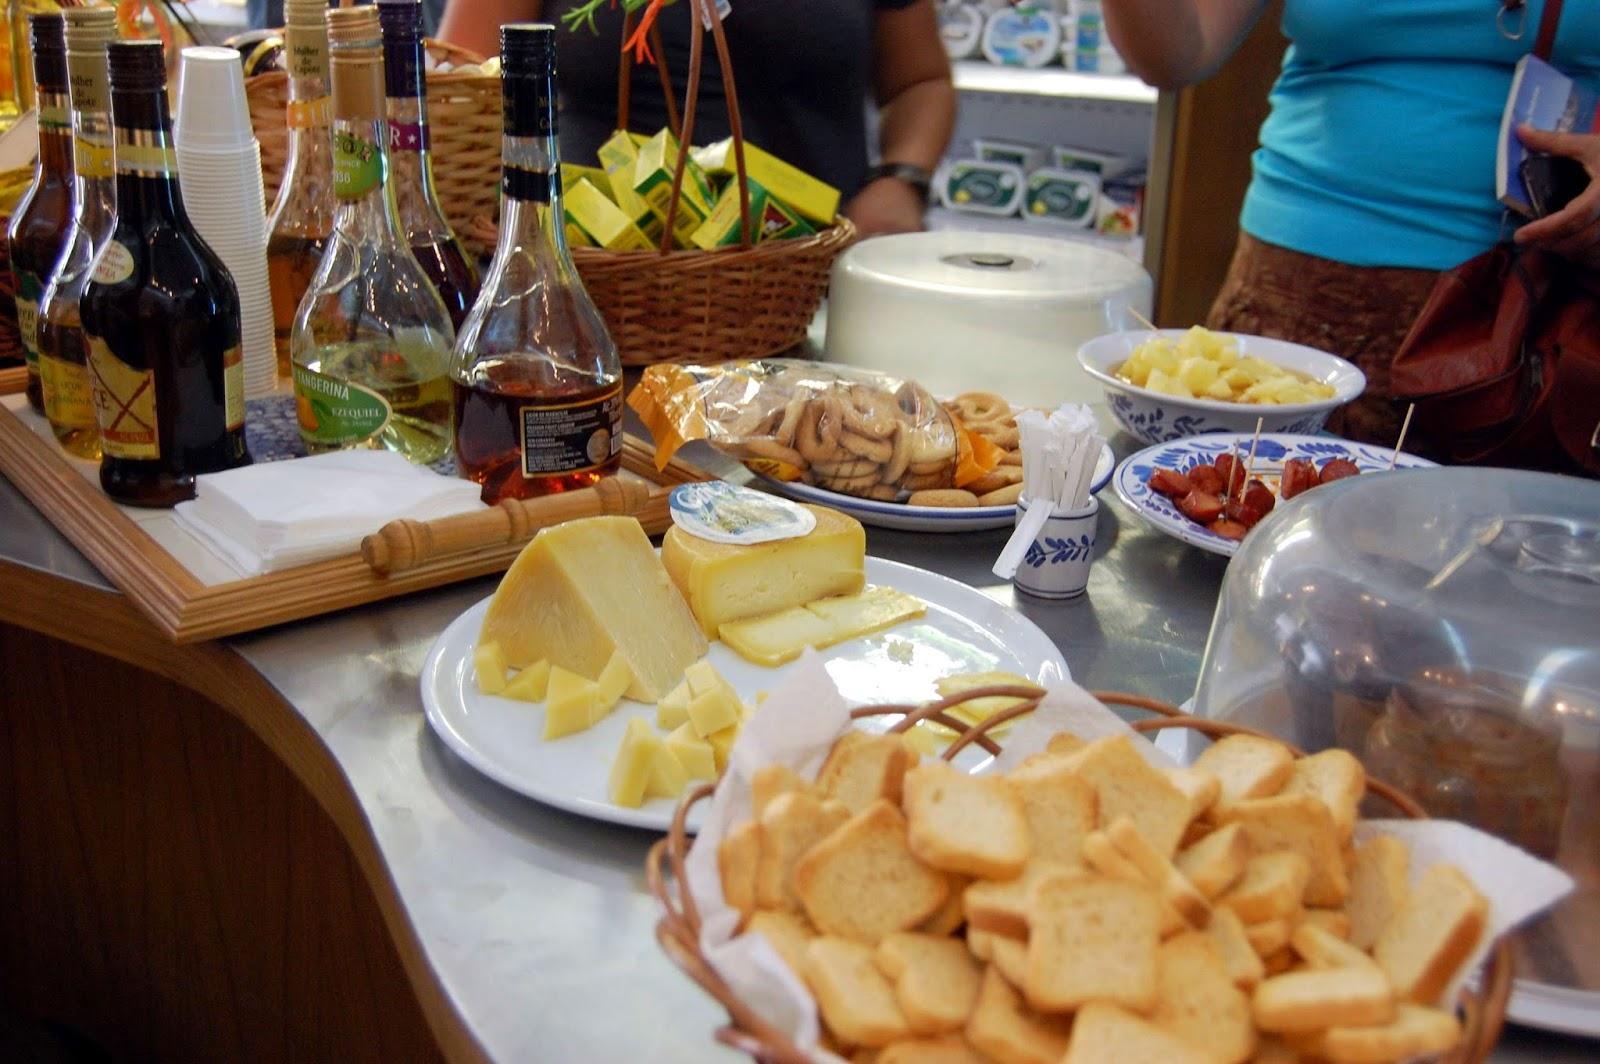 Stitch & Bear - Eat Drink Walk Petiscos Lisbon - Liqueur and cheese tasting